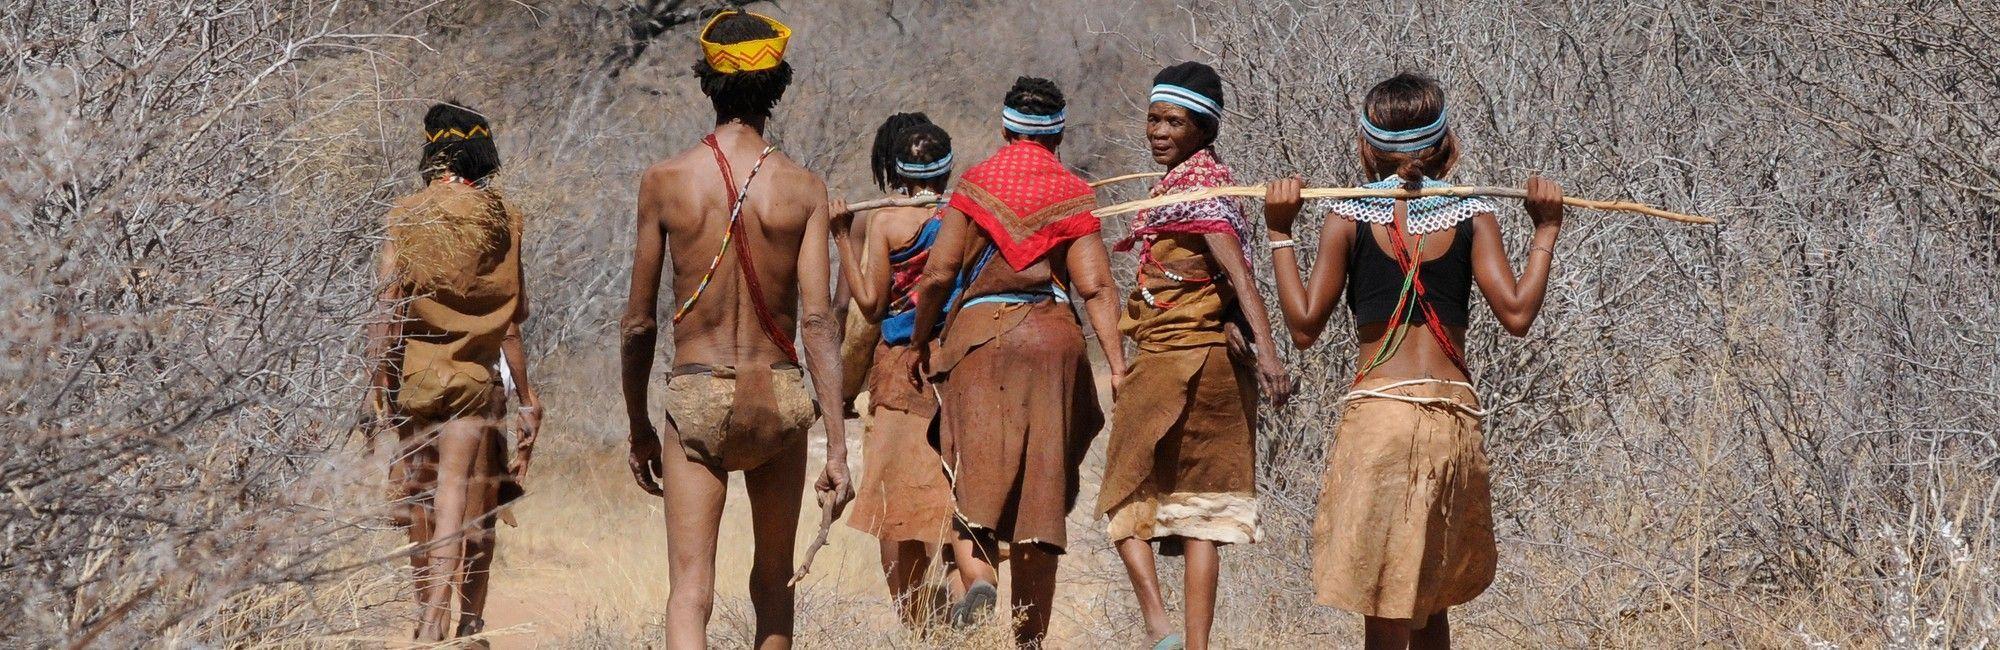 Kampeersafari Botswana Compleet